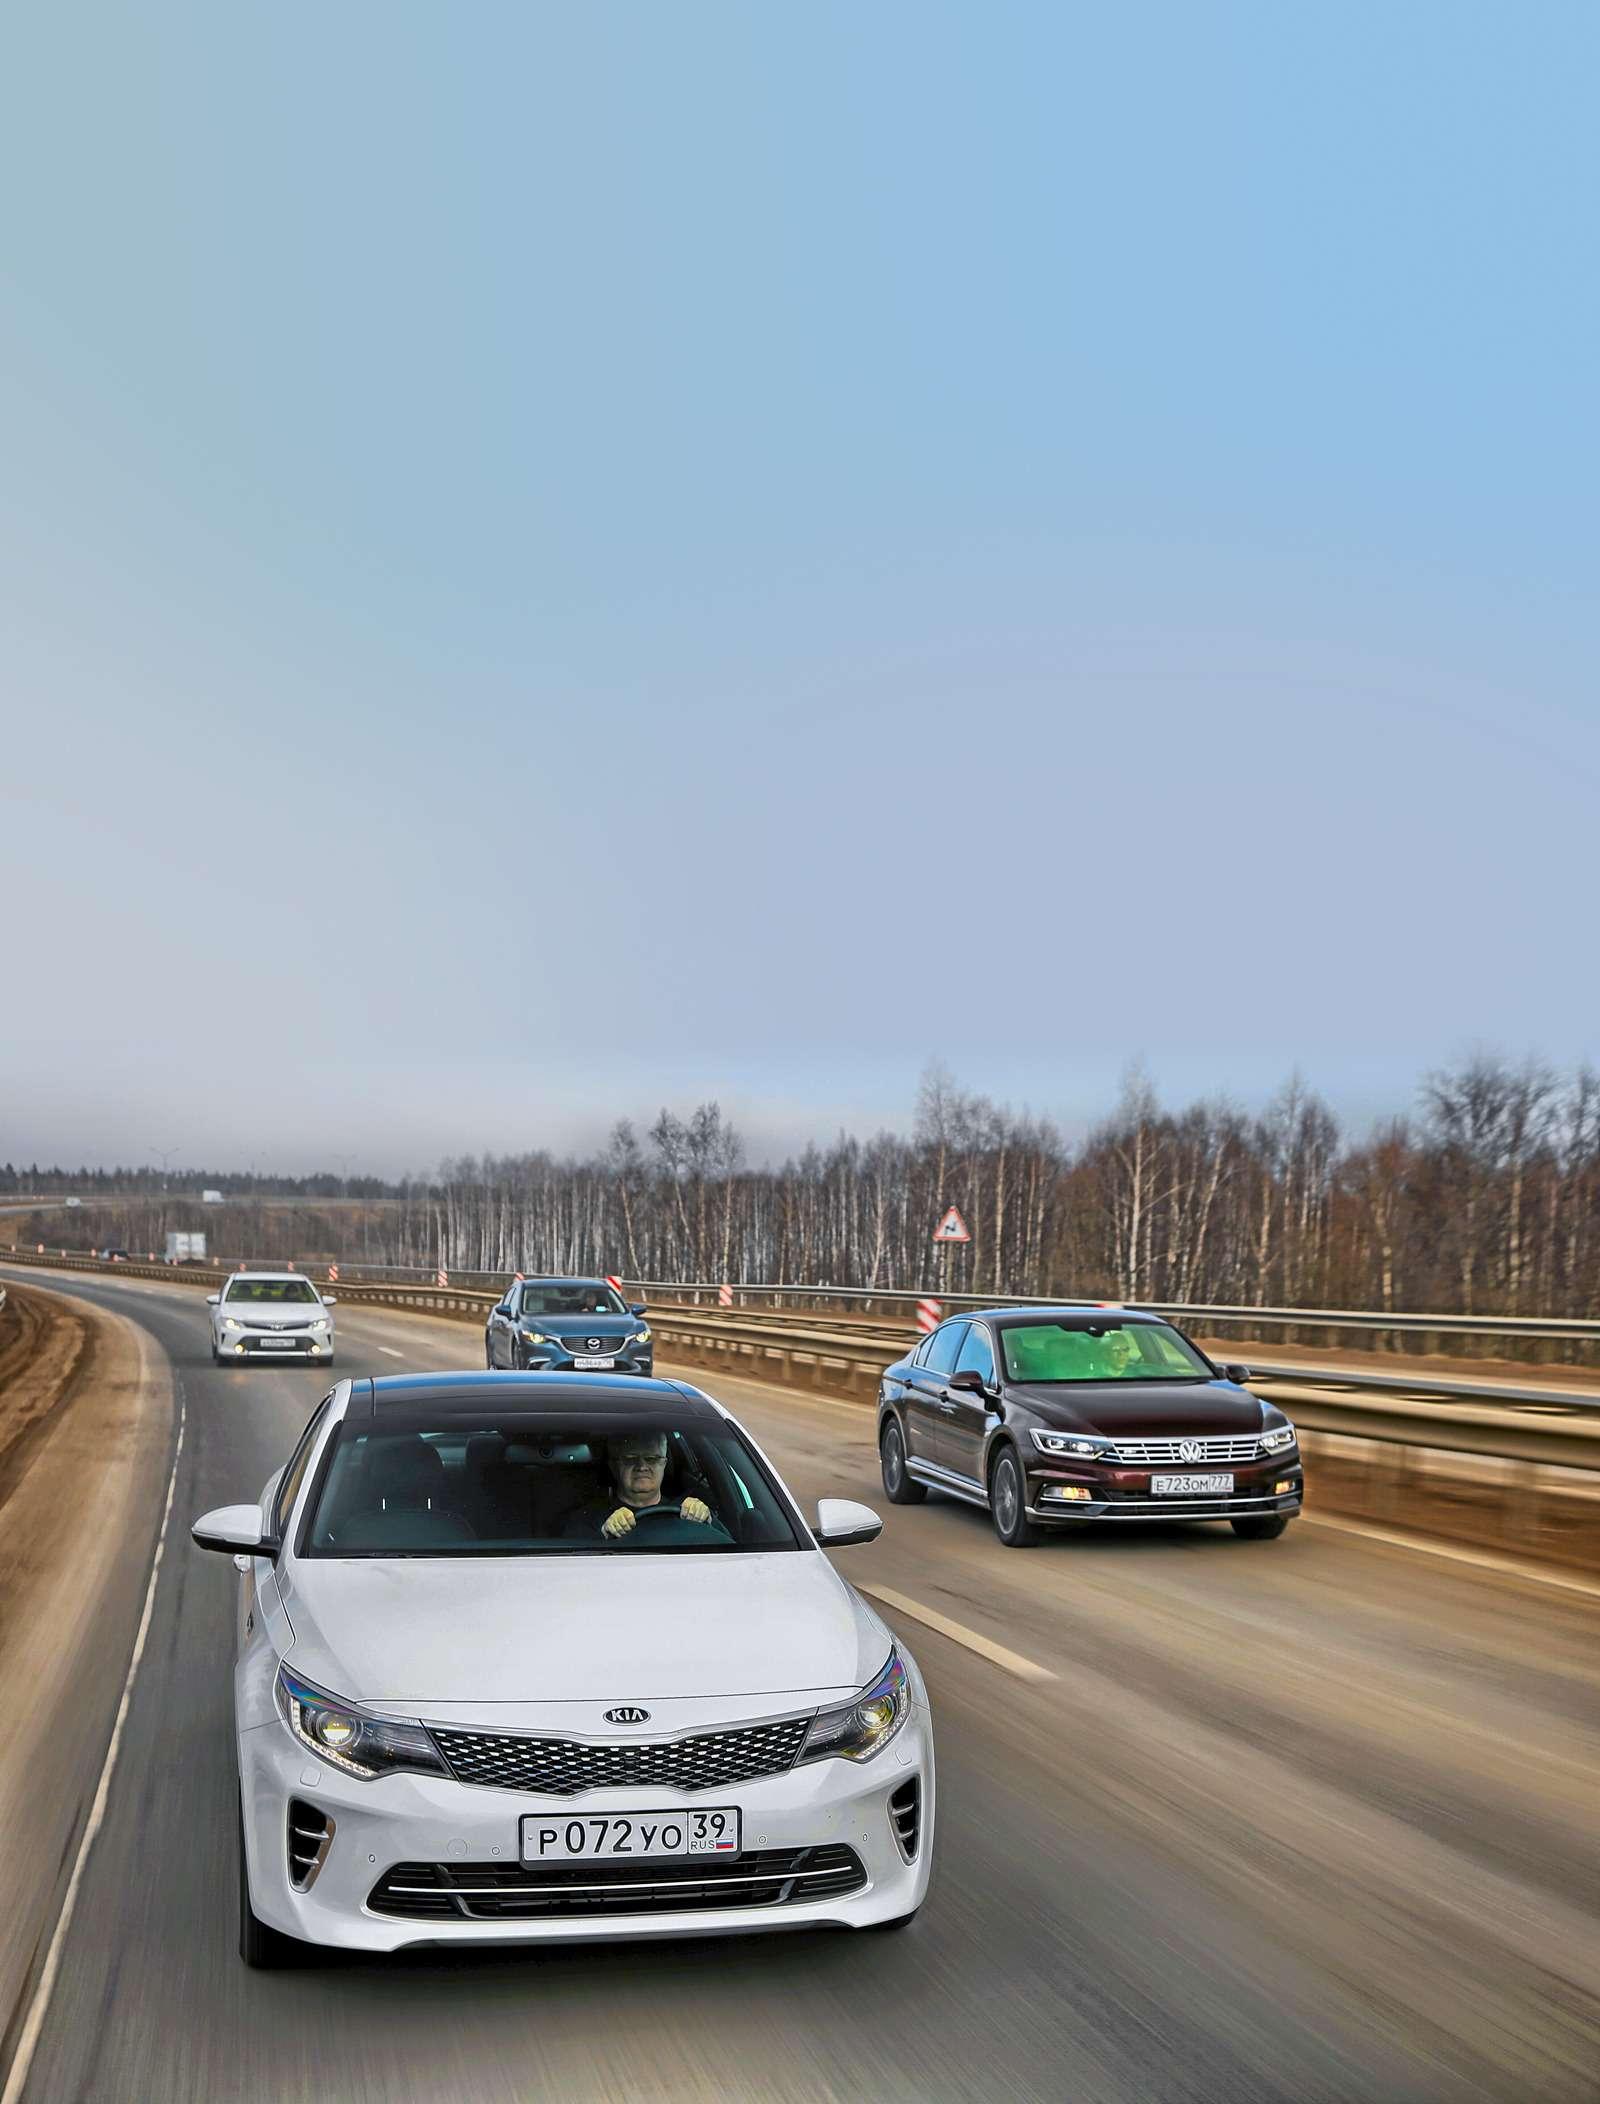 Супертест: новая Kia Optima против трех конкурентов— фото 596126